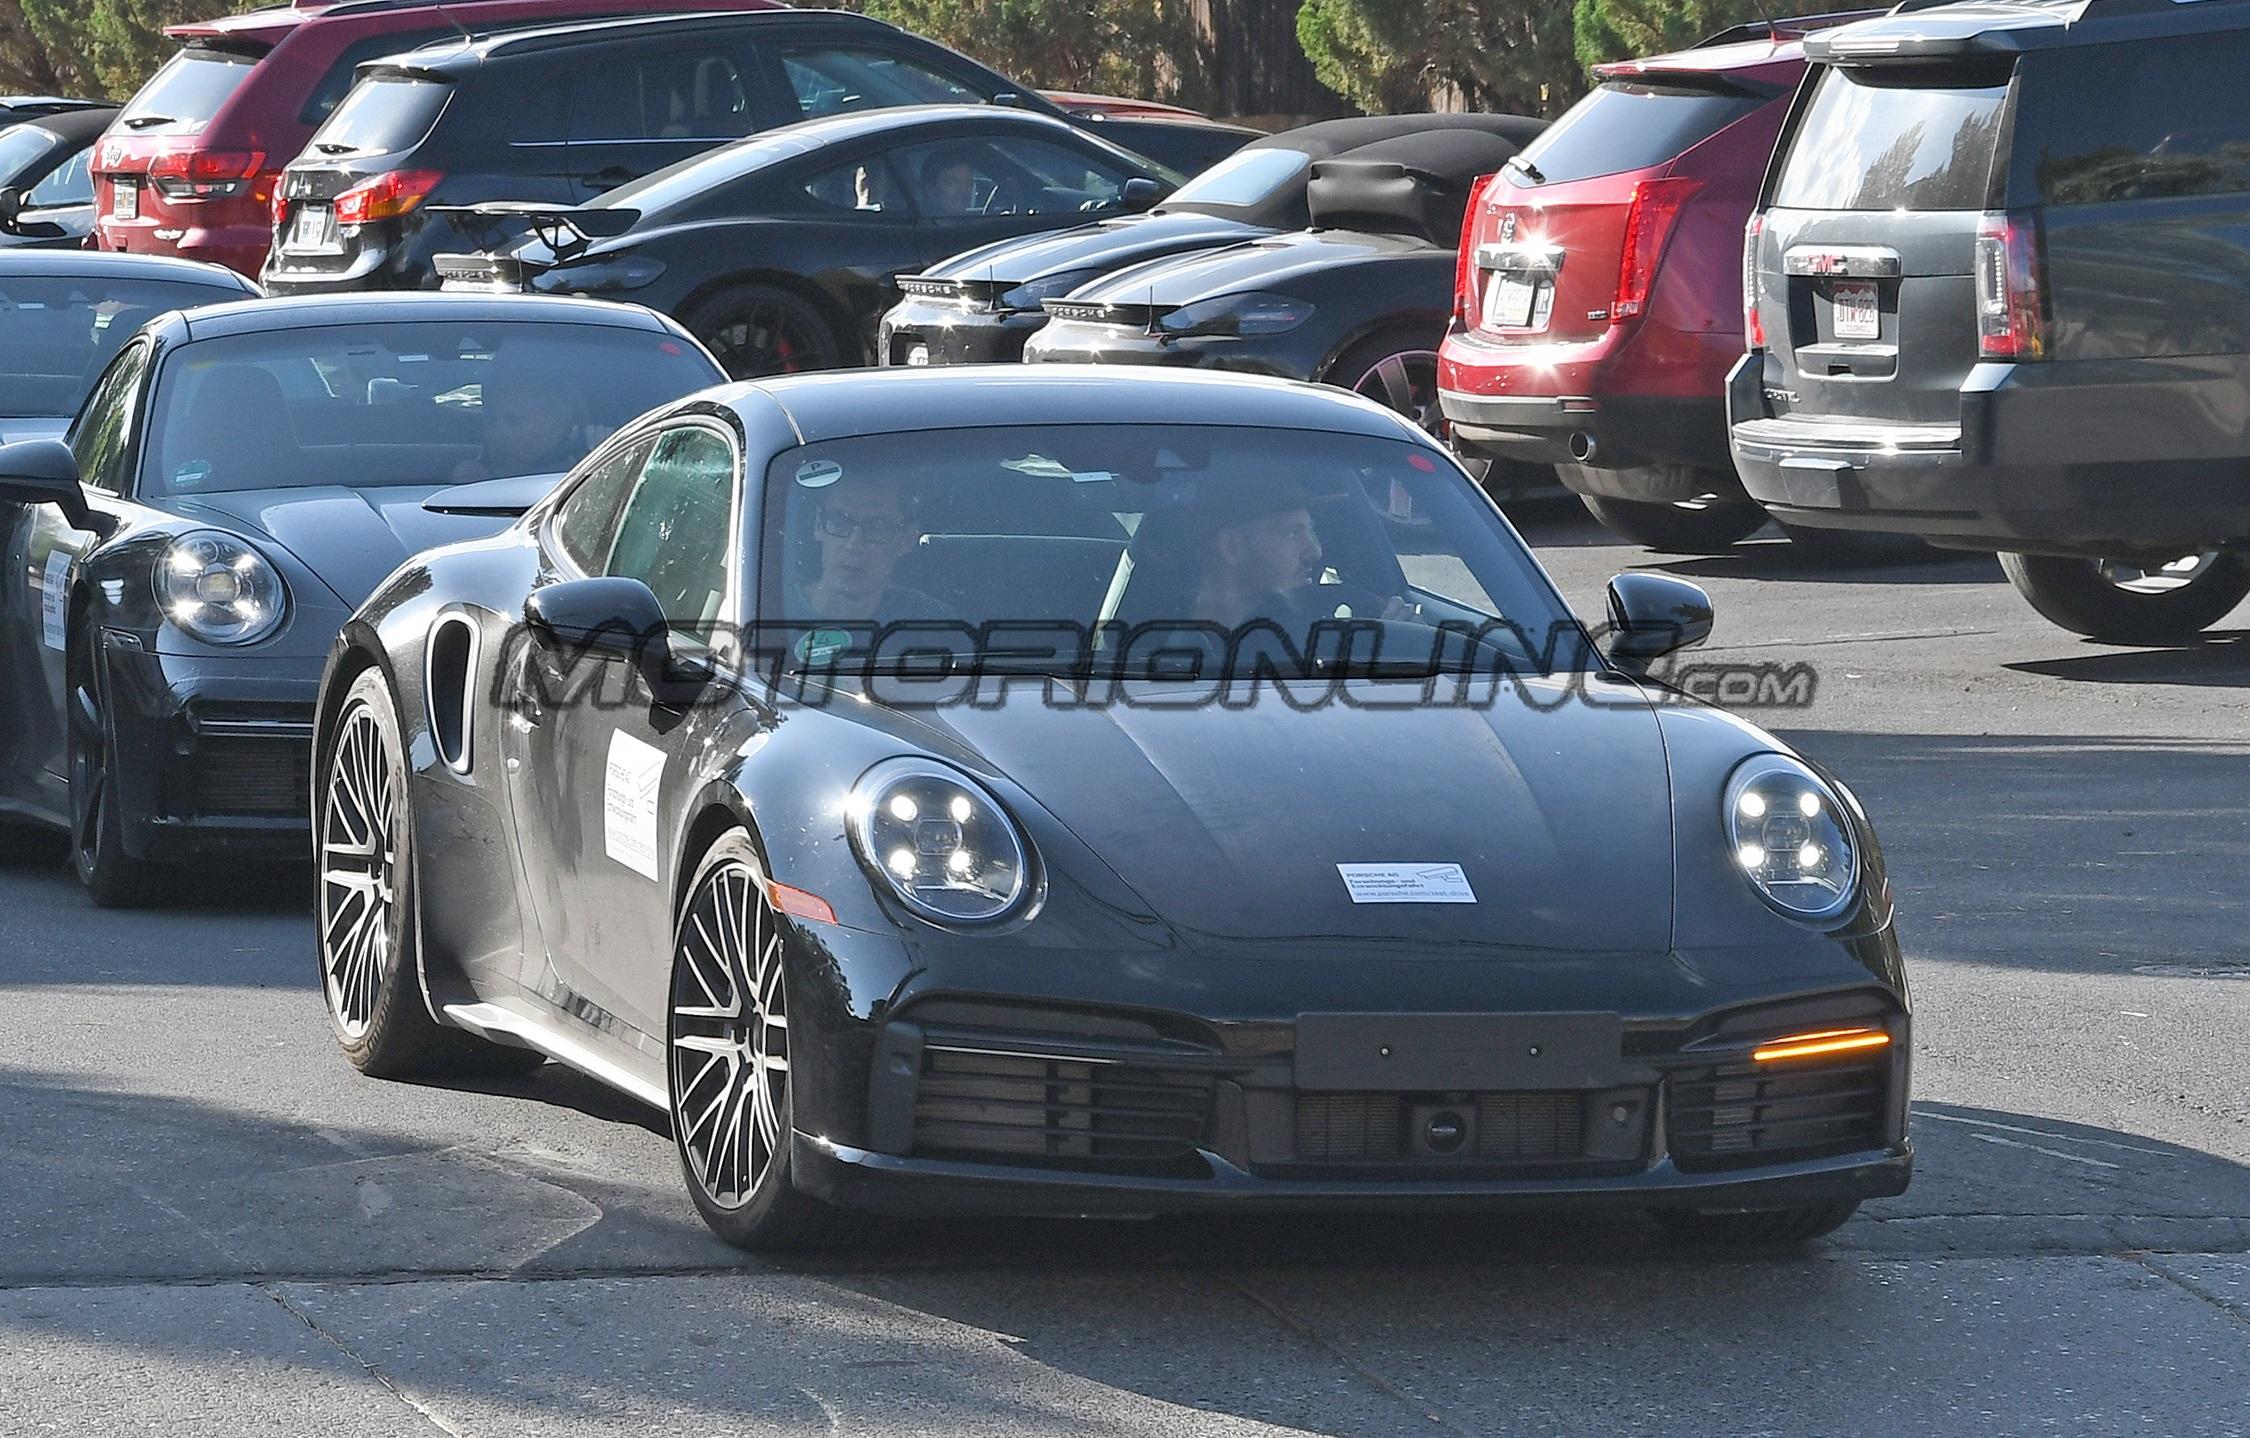 Porsche 911 Turbo S 2020 - Foto spia 27-09-2019